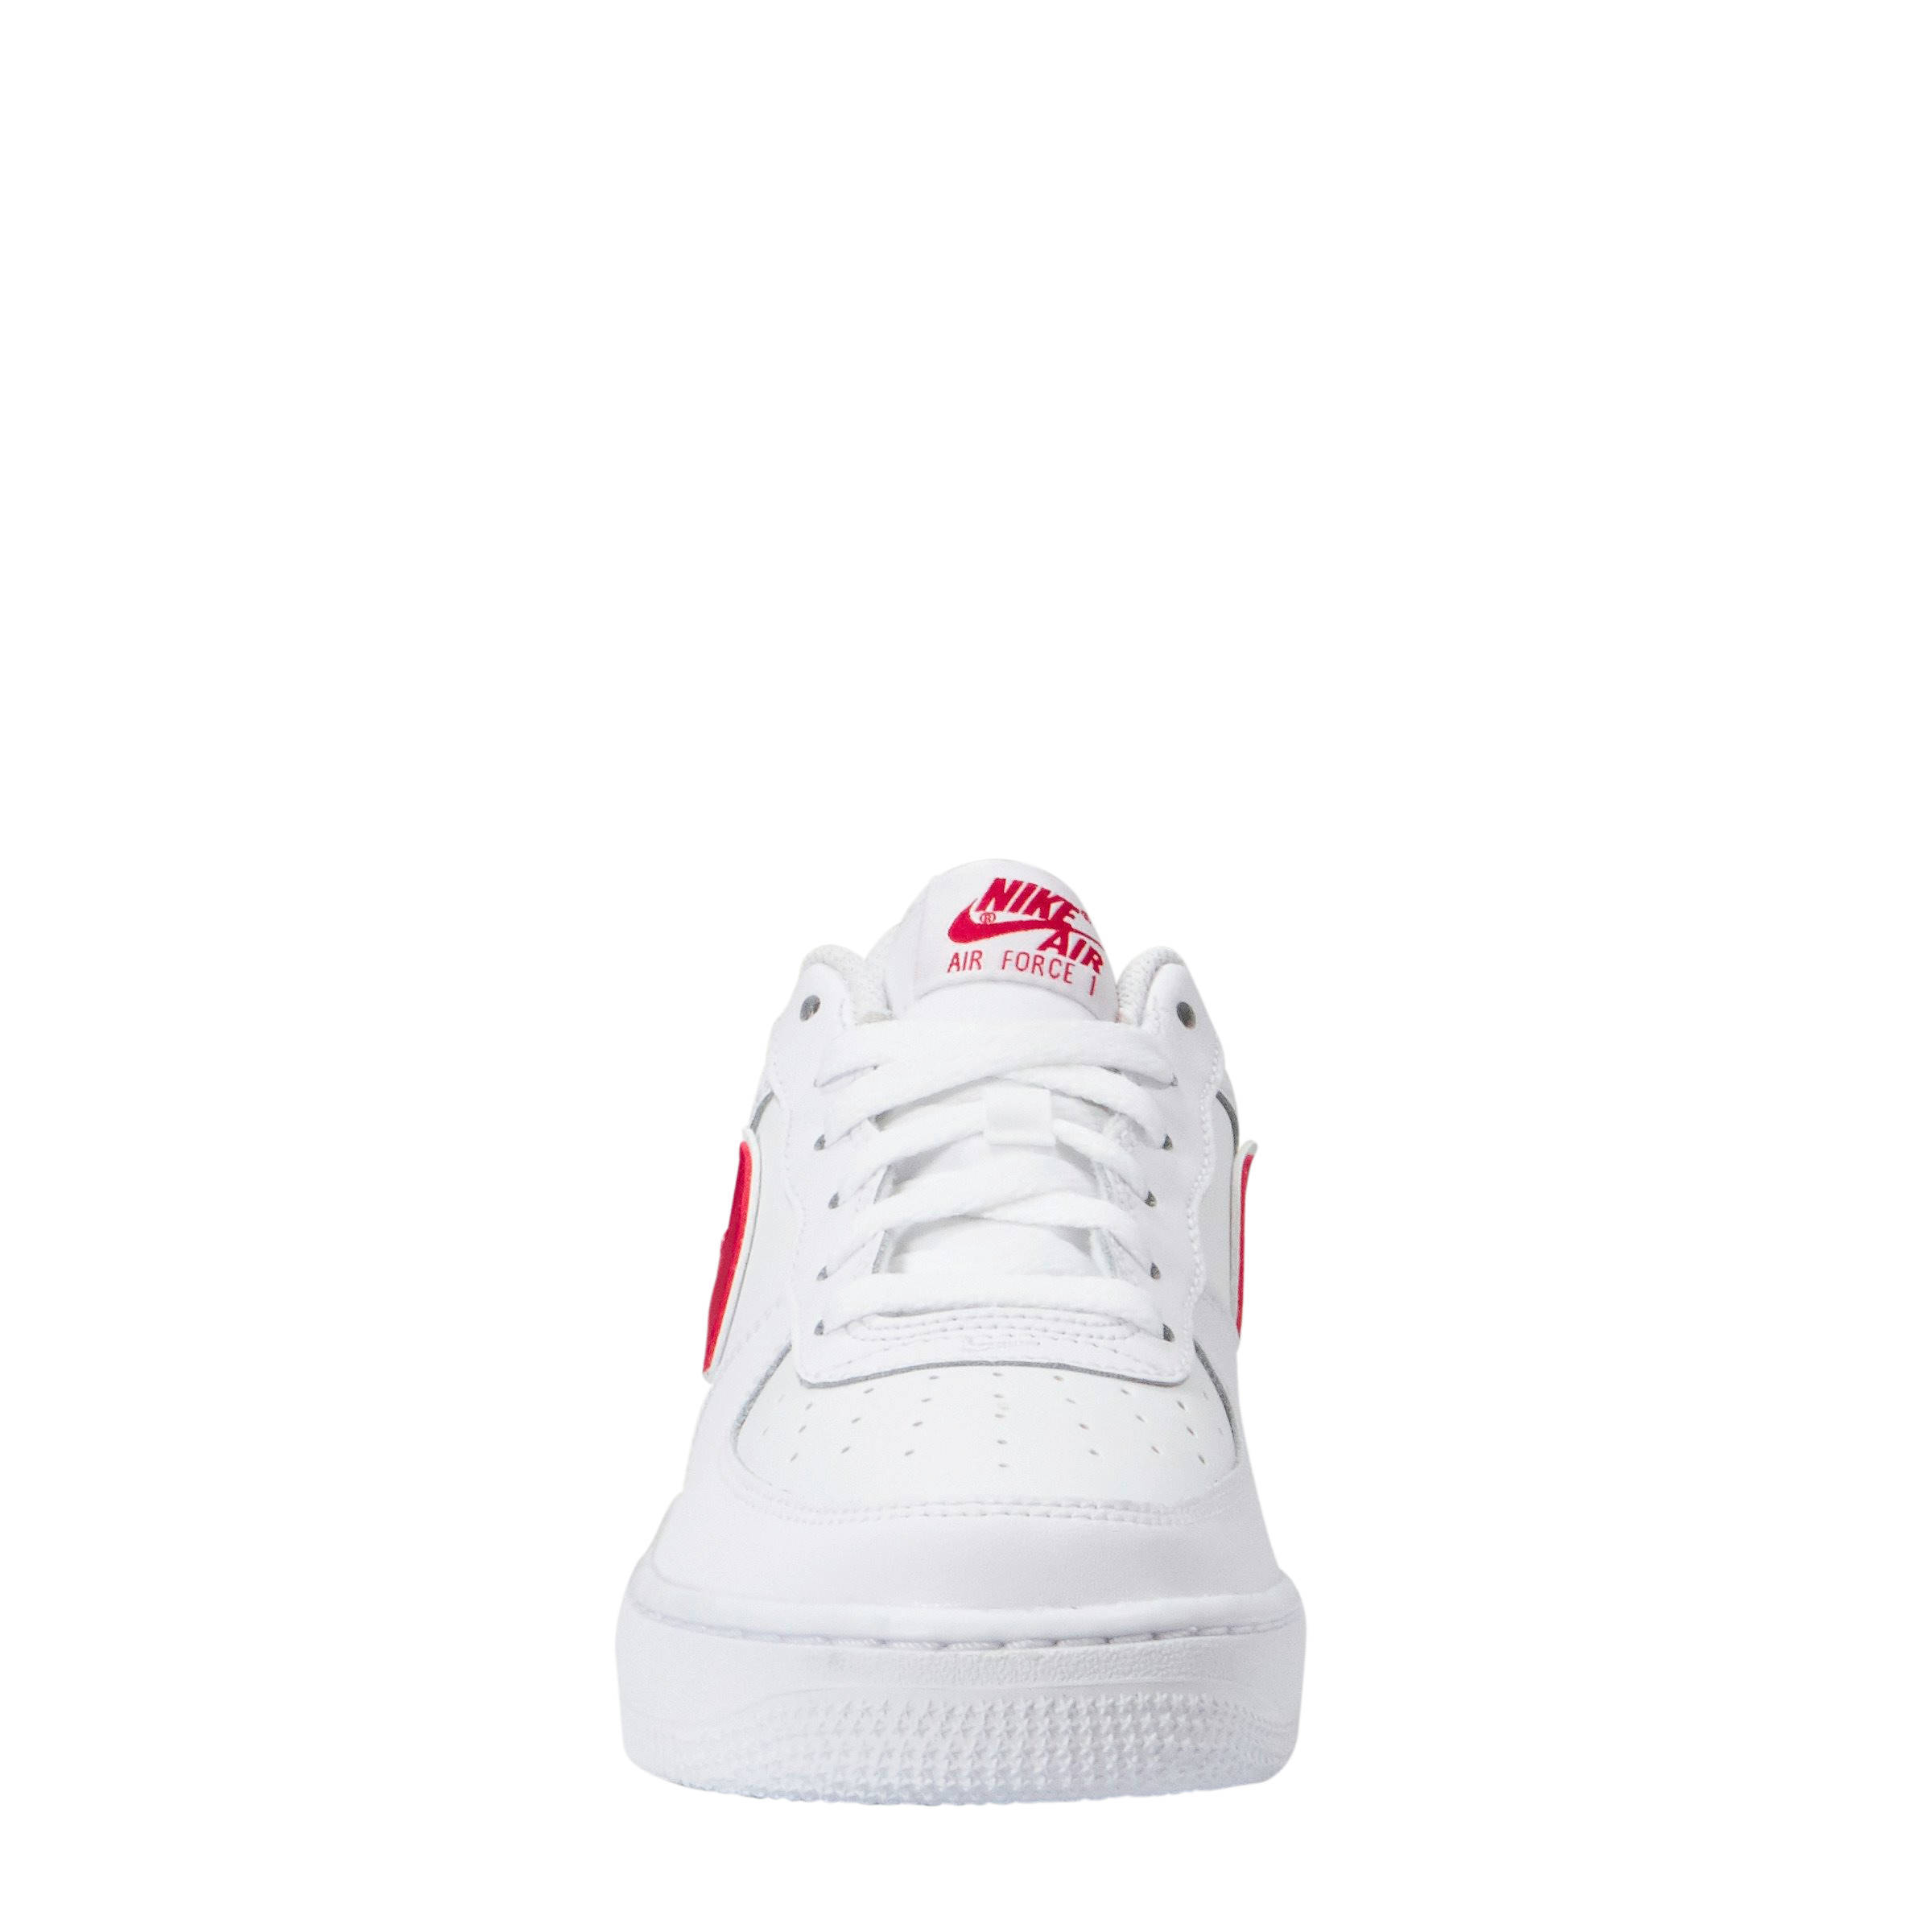 official photos 80c9d 5ca95 Nike Air Force 1-3 (GS) sneakers leer wit rood   wehkamp